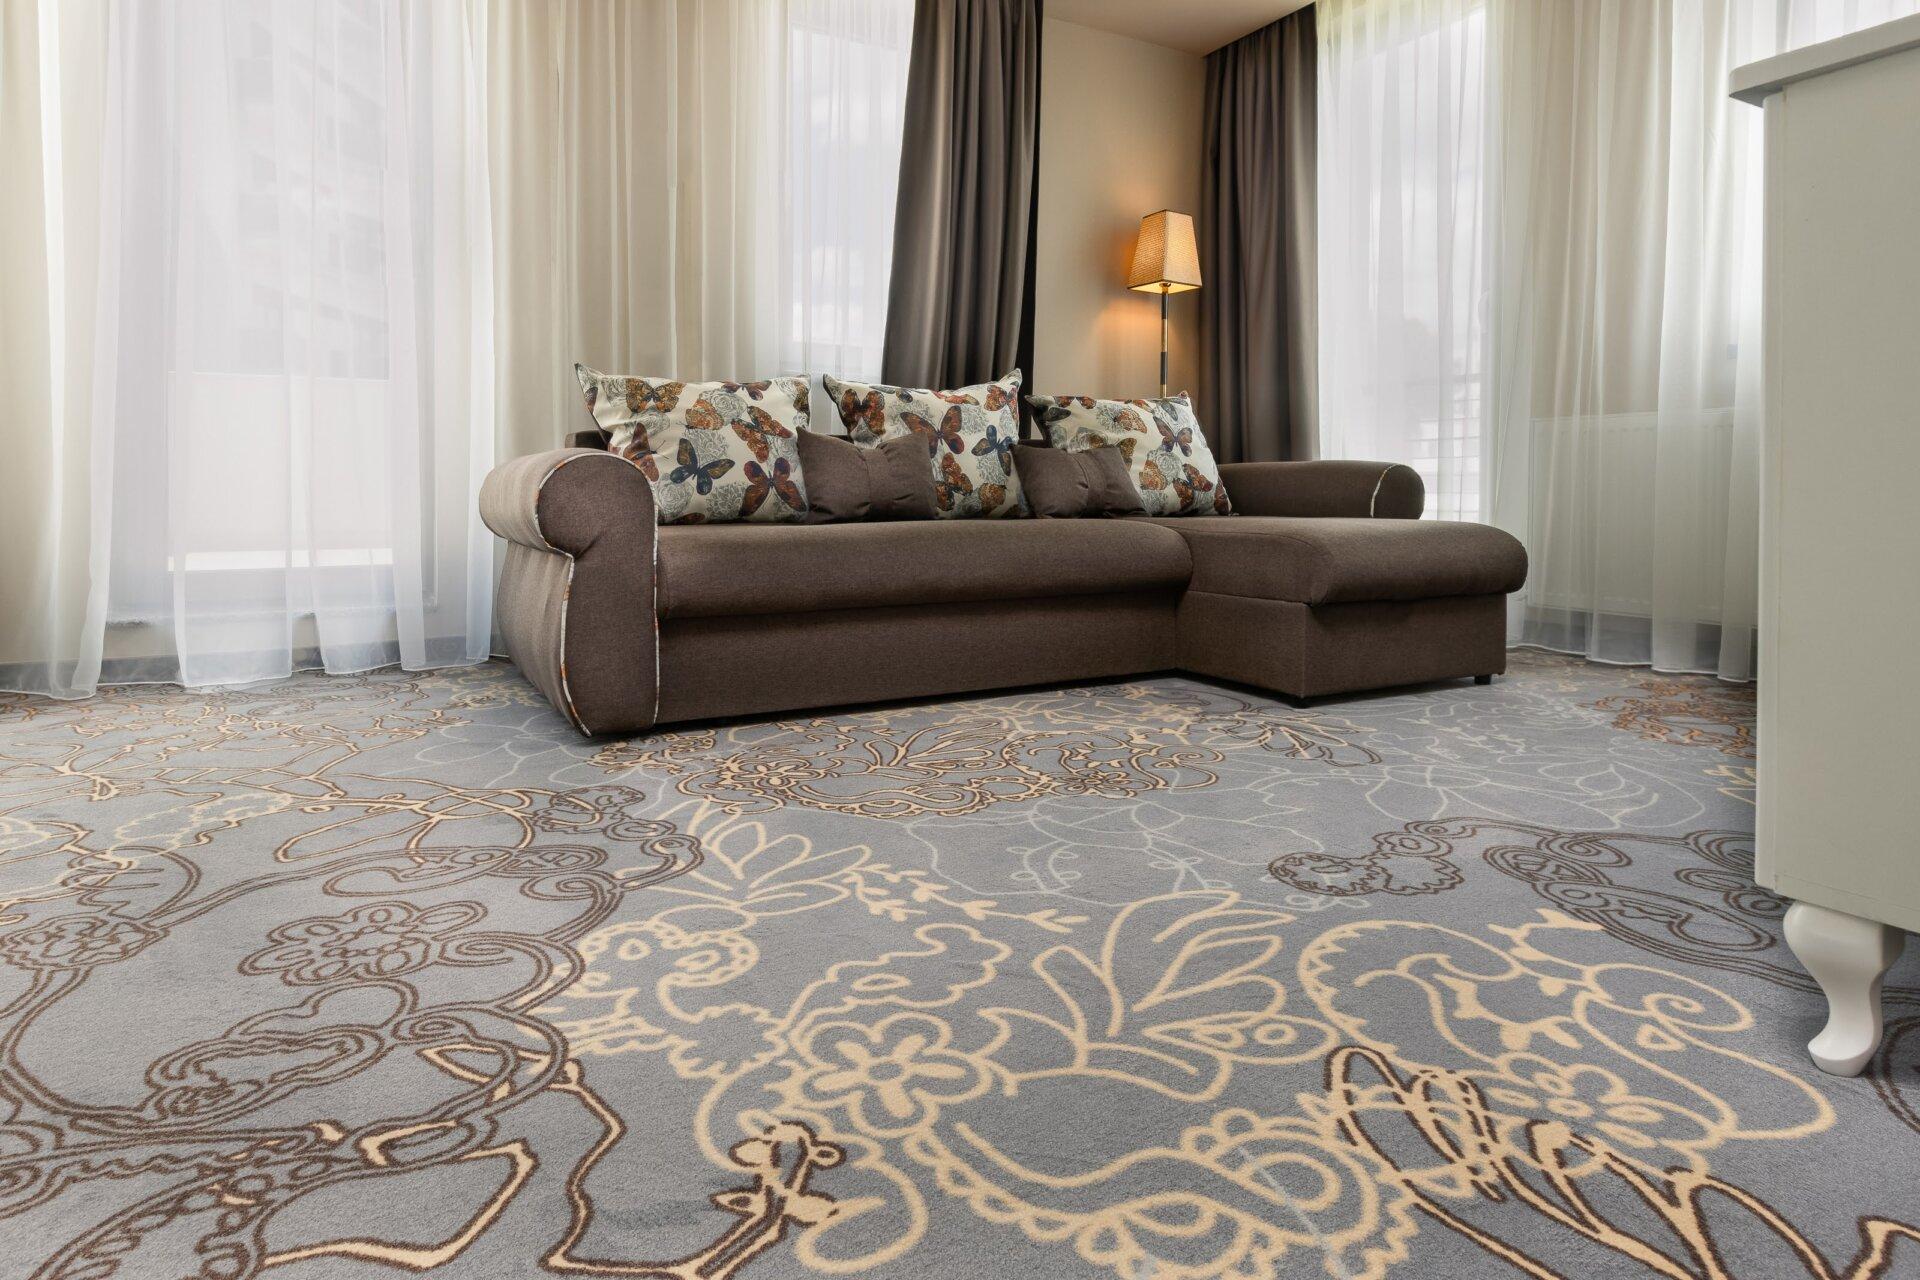 20210524-carpet&more-mamaia-hotel-scapino-junior-by-hugmedia-033